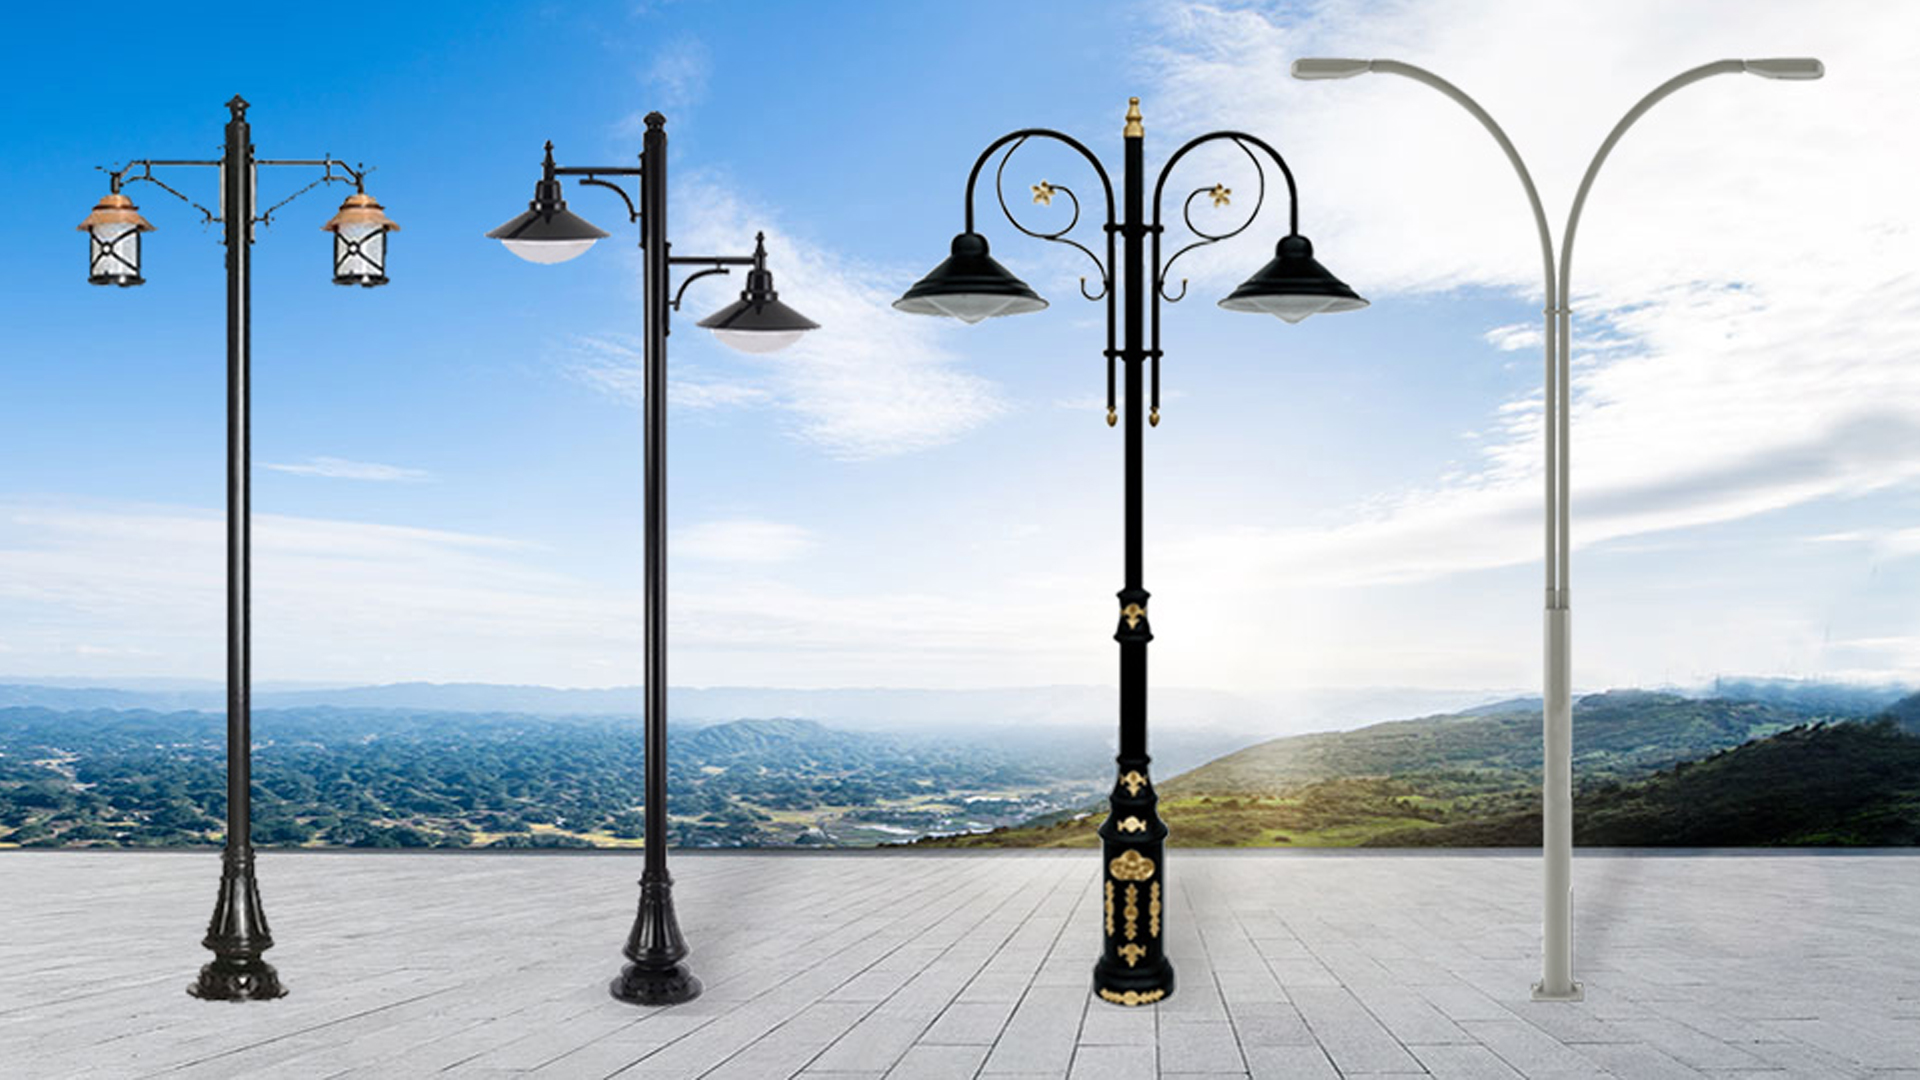 sokak-aydinlatma-lambasi-dekoratif-ankar